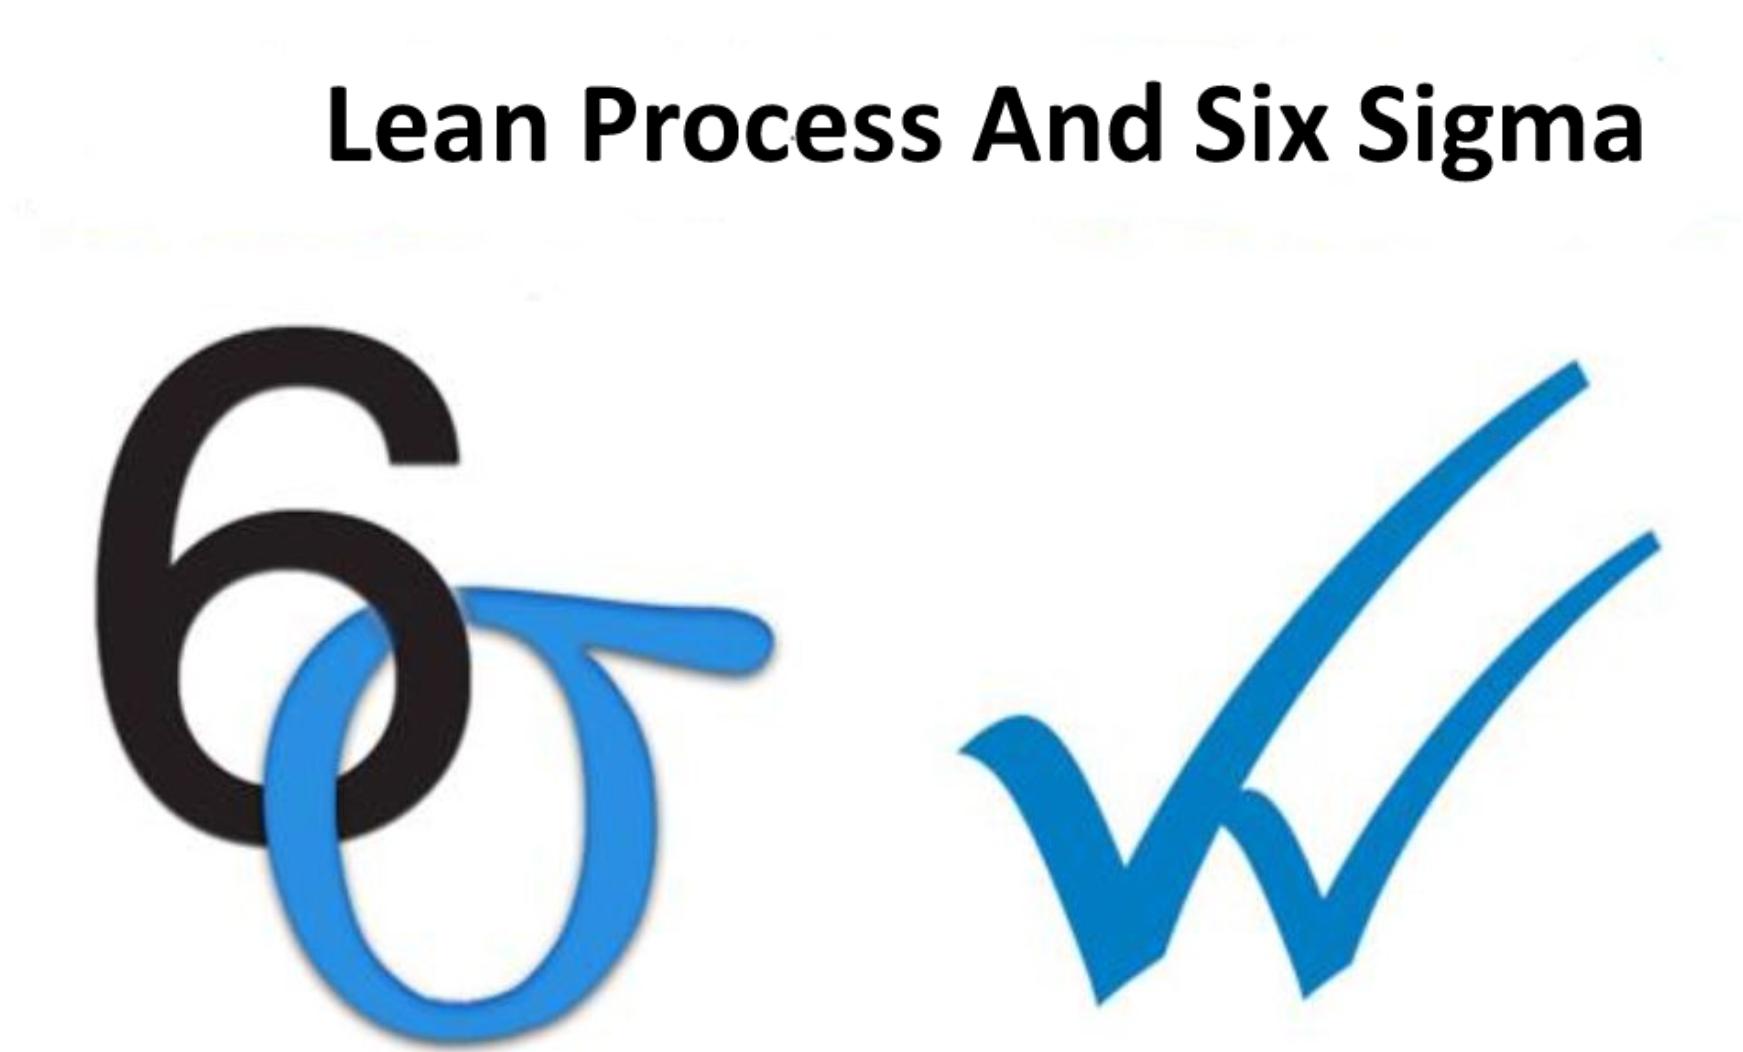 Lean Process & Six Sigma